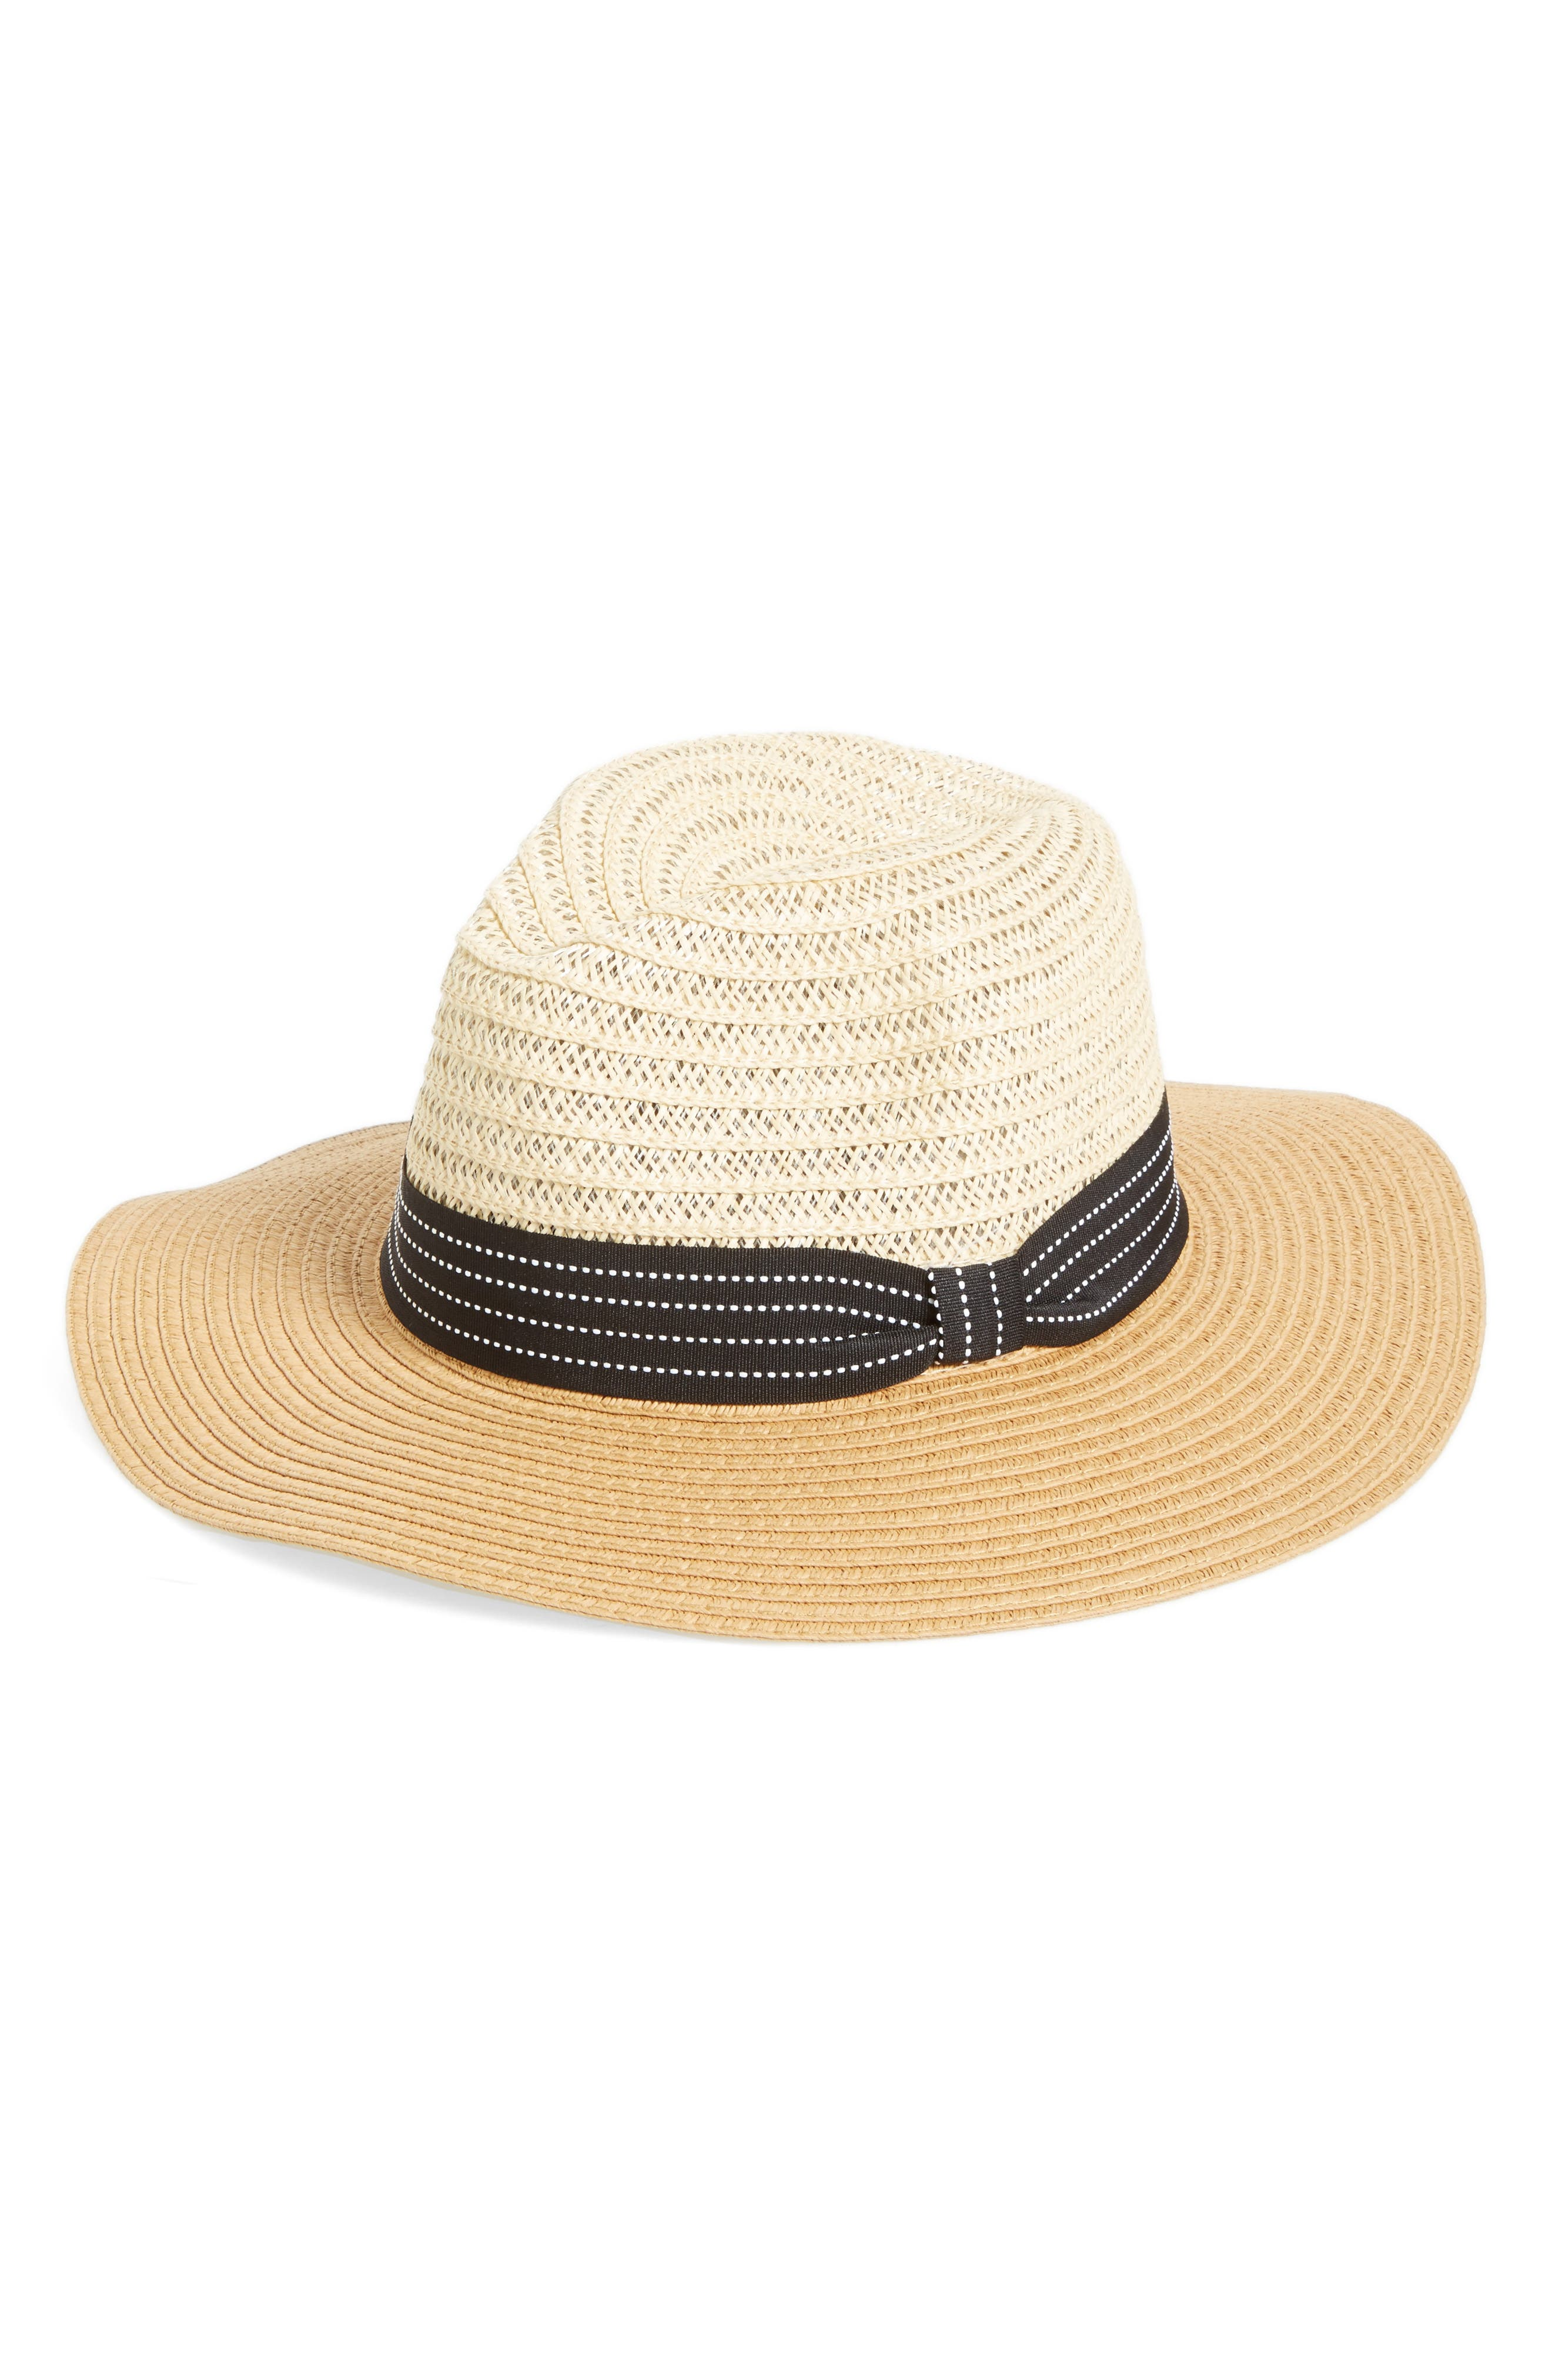 Two Tone Straw Panama Hat,                         Main,                         color, Natural